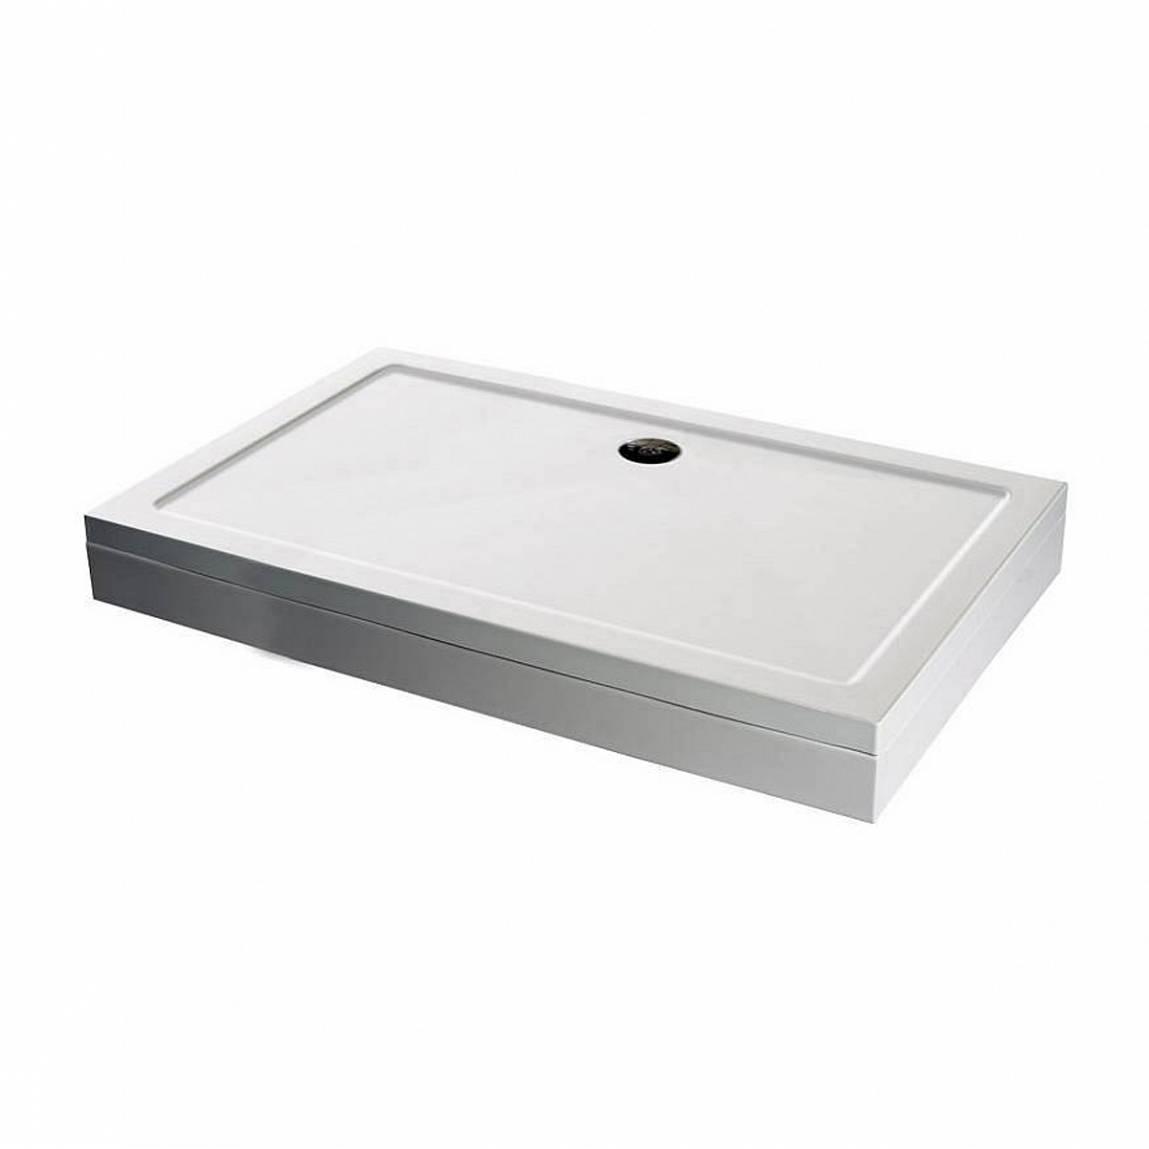 Image of Rectangular Stone Shower Tray & Riser Kit 1400 x 900